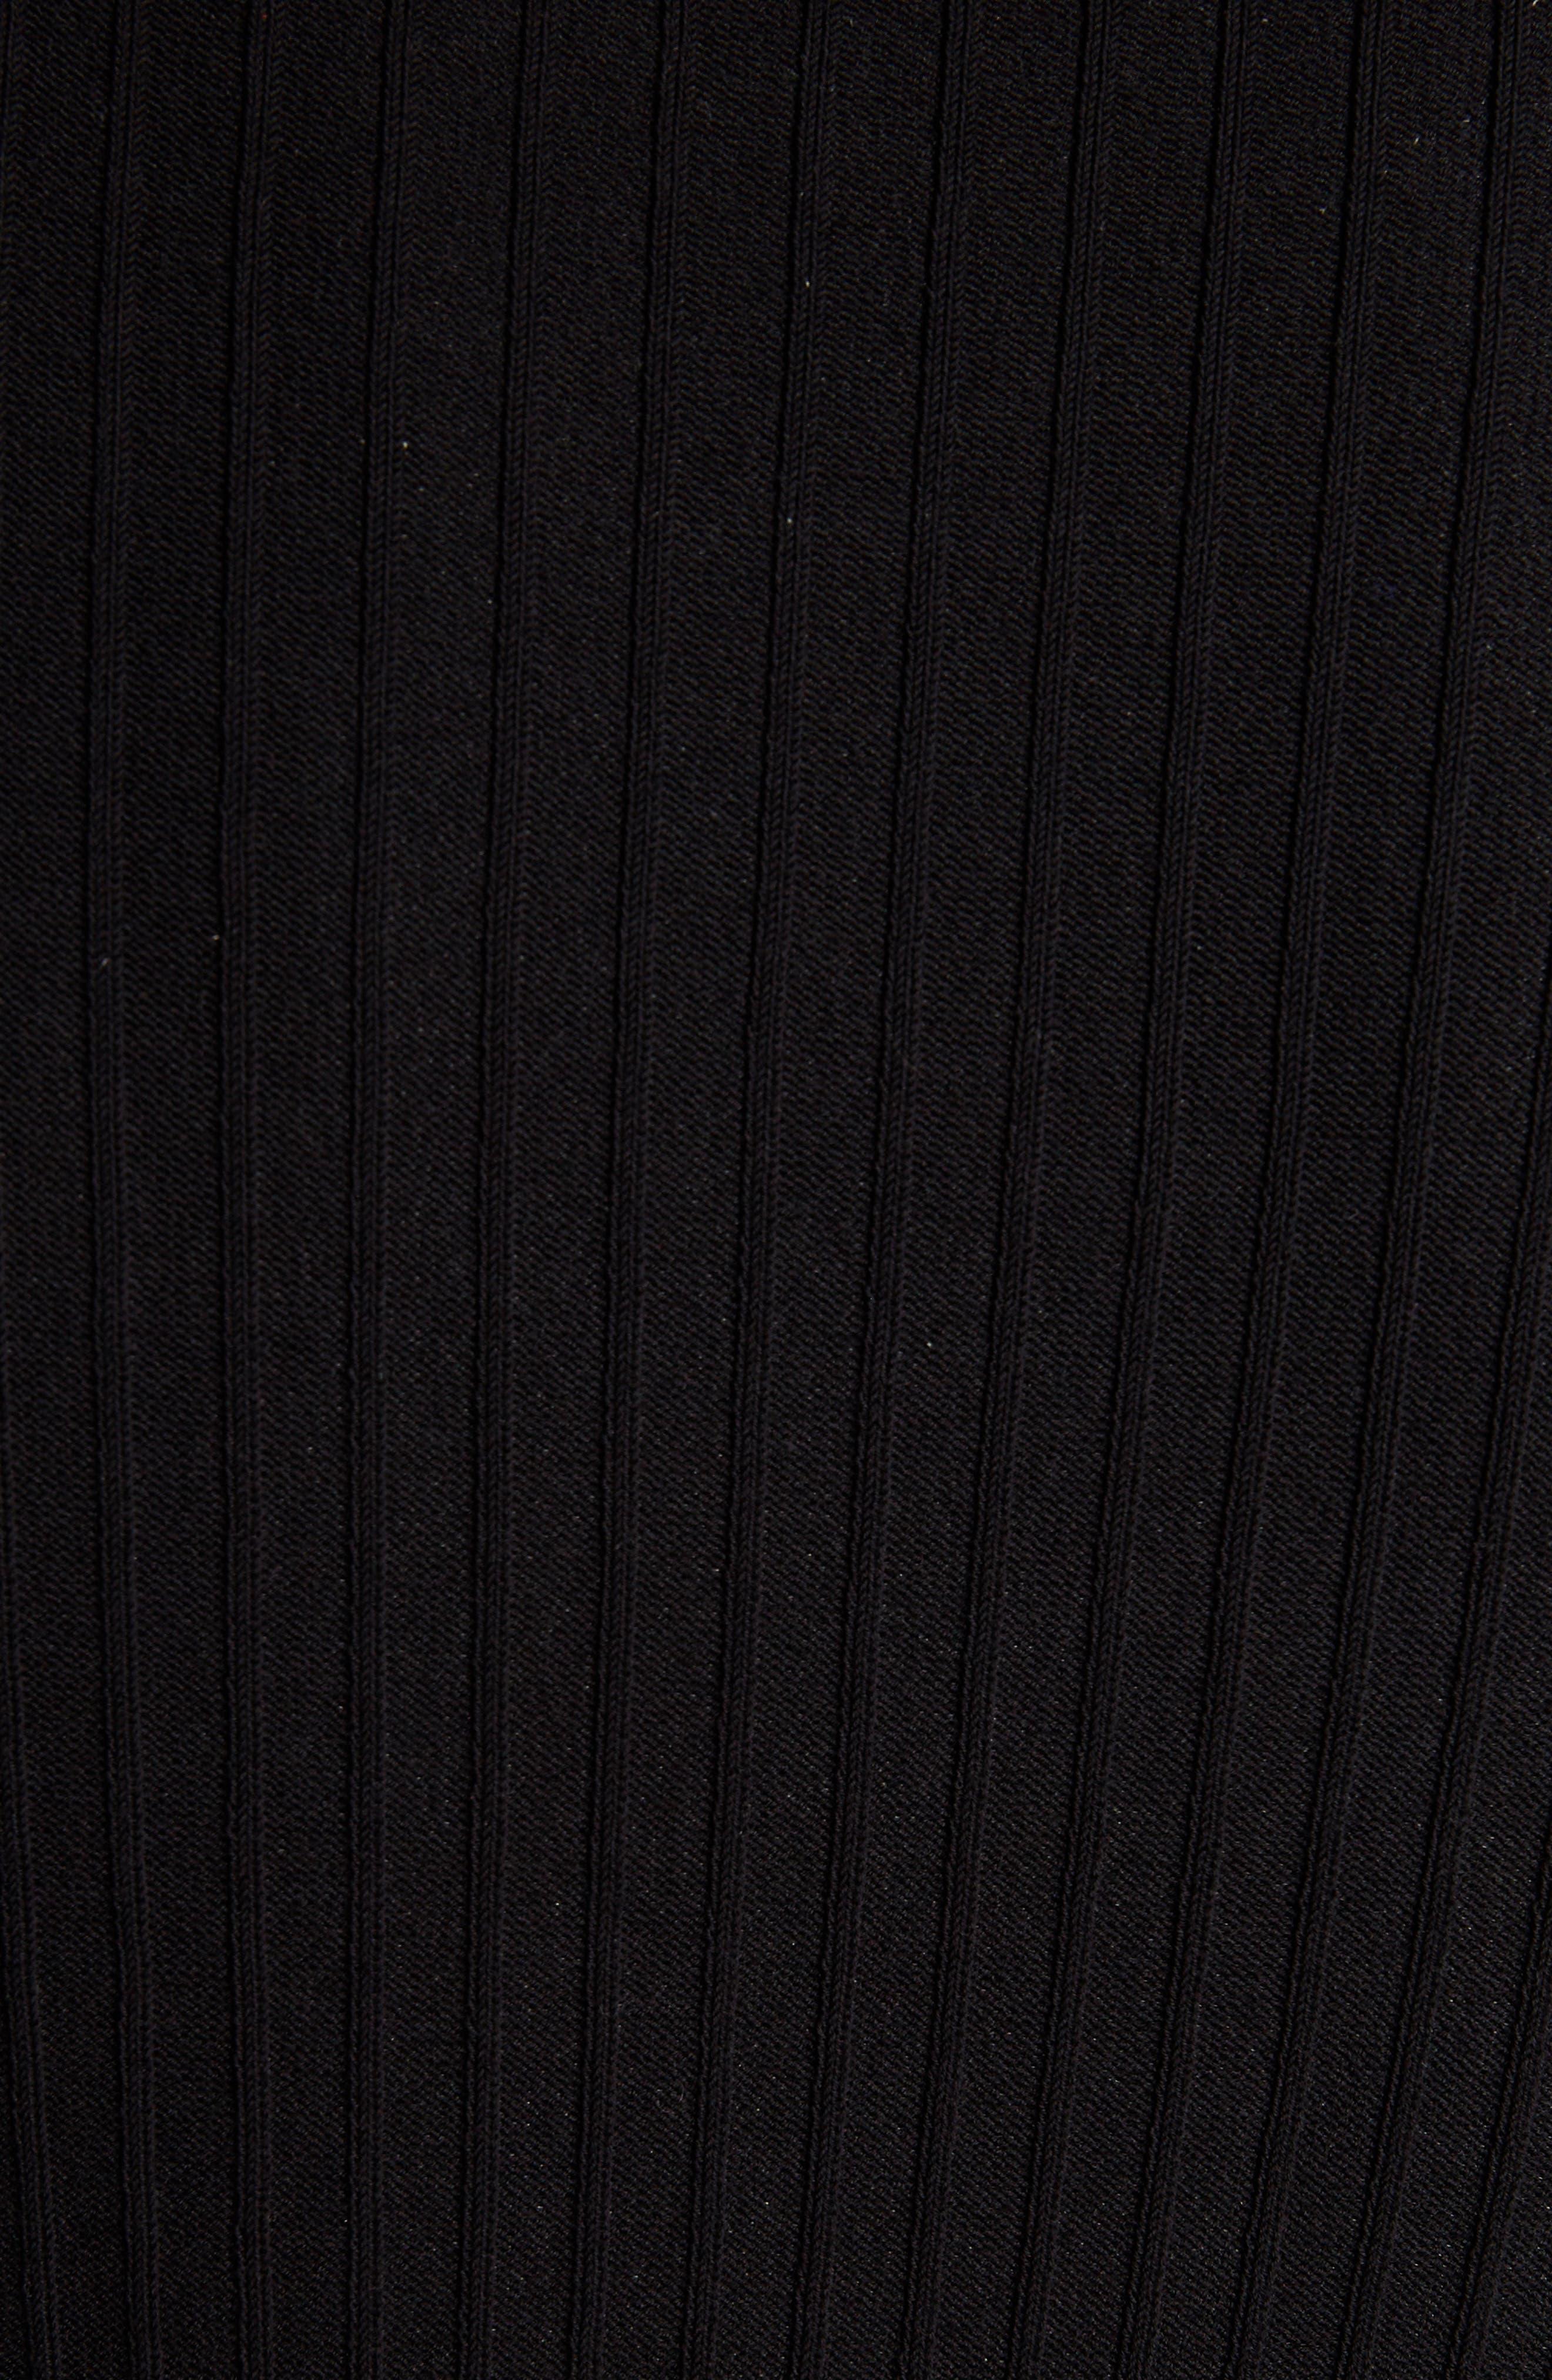 Acne Design Studios Iza Ribbed Sweater,                             Alternate thumbnail 5, color,                             001